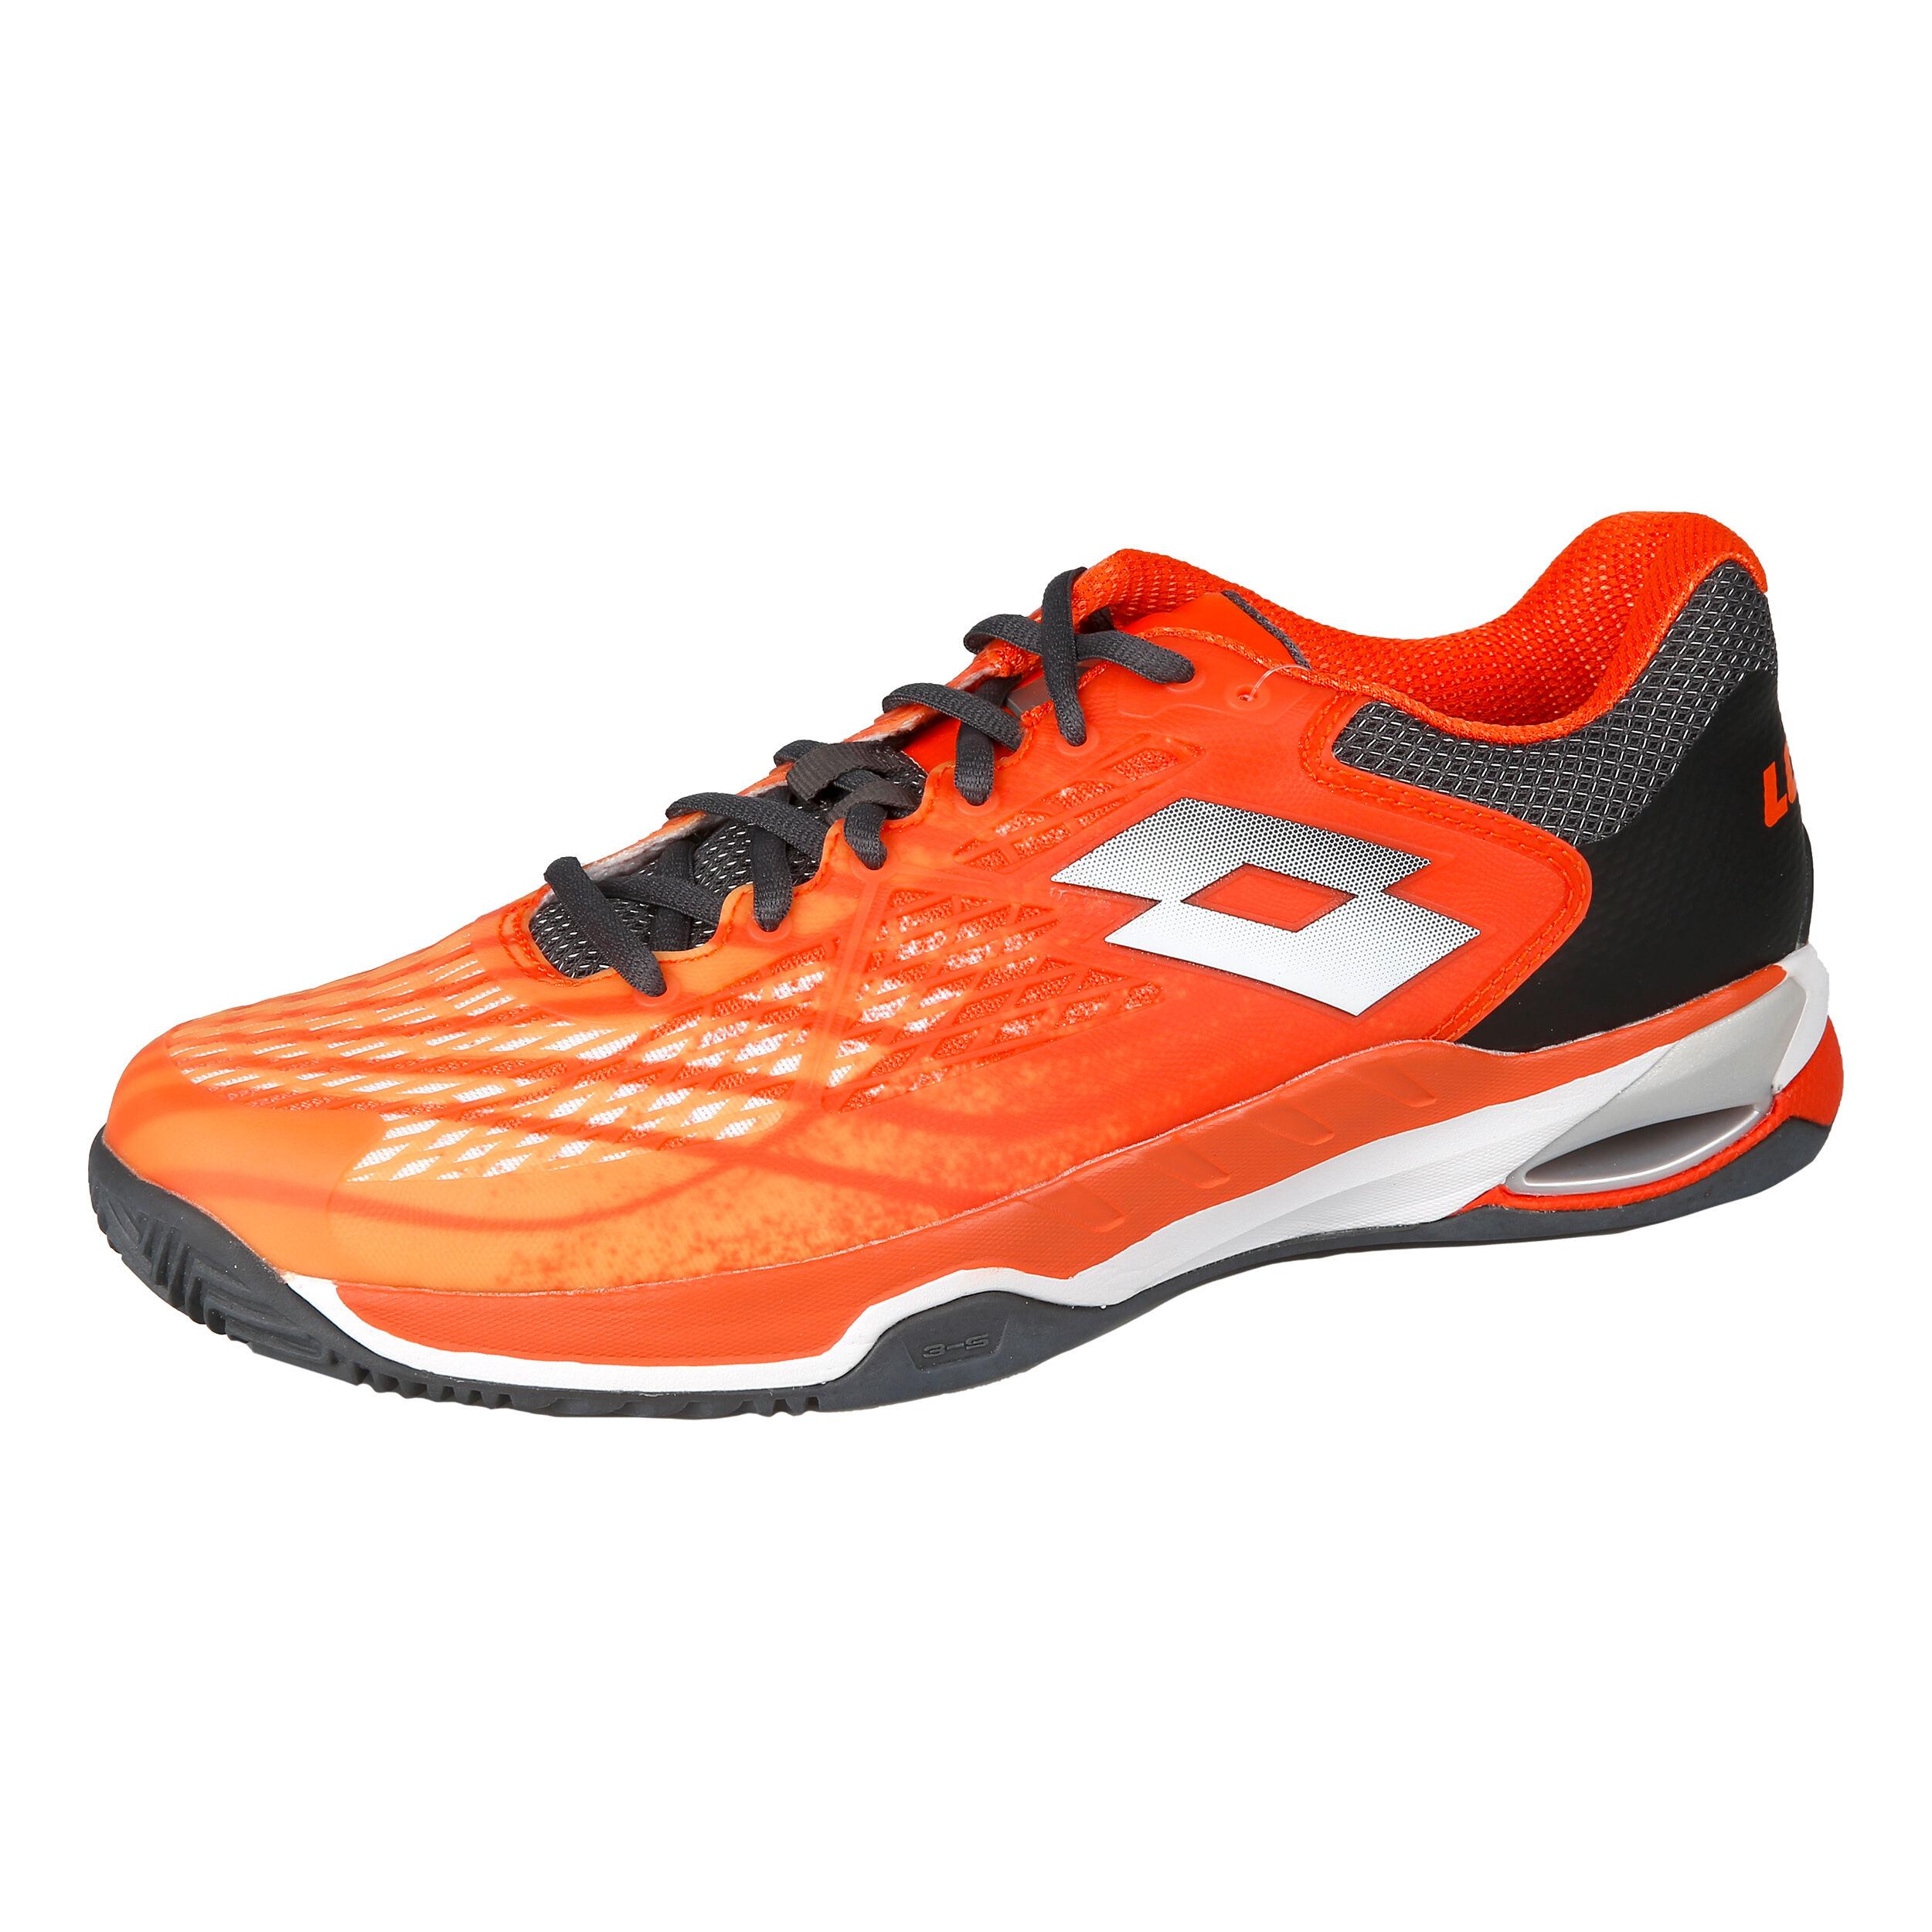 Lotto Hommes Mirage 100 Clay Chaussures De Tennis Chaussure Terre Battue Orange Gris 44